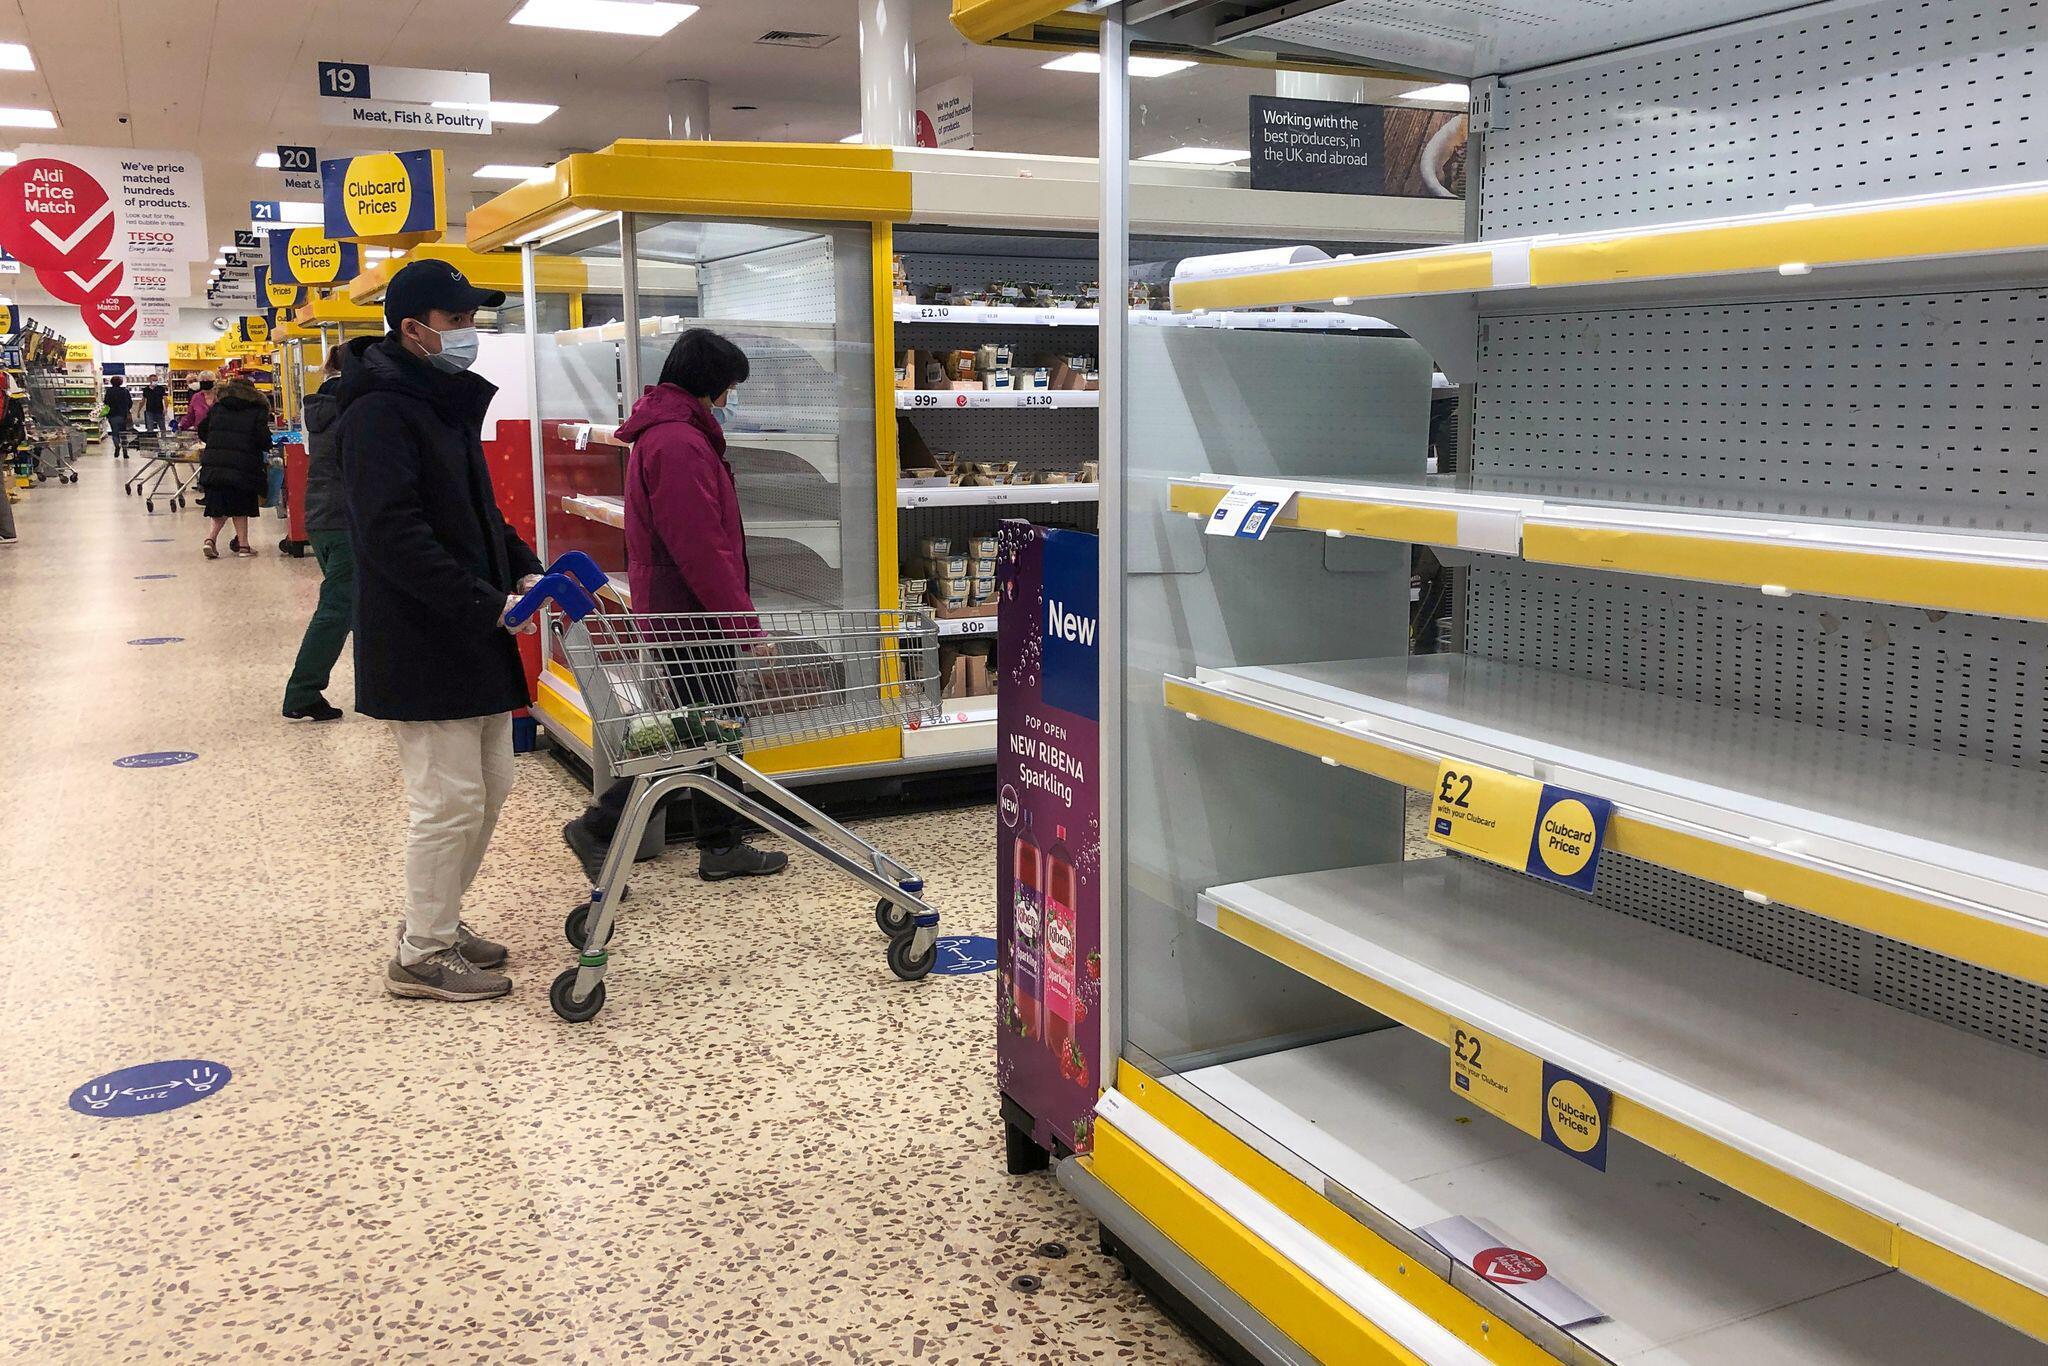 Bild zu Coronavirus - leere Supermärkte in Großbritannien